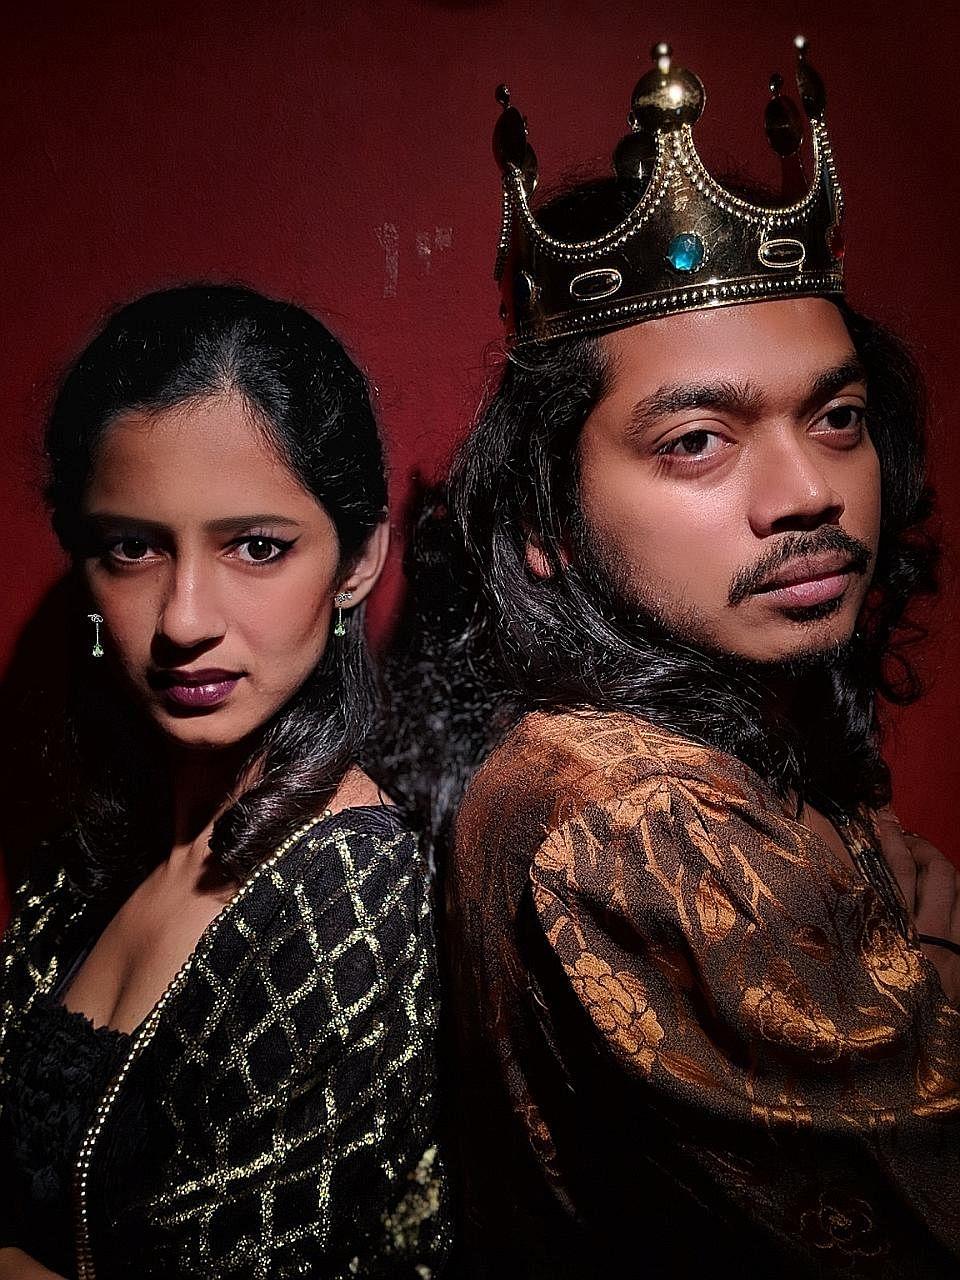 Anna Jos plays Lady McBeth and Farhan Ahmed is McBeth in McBeth, a parody of Shakespeare.